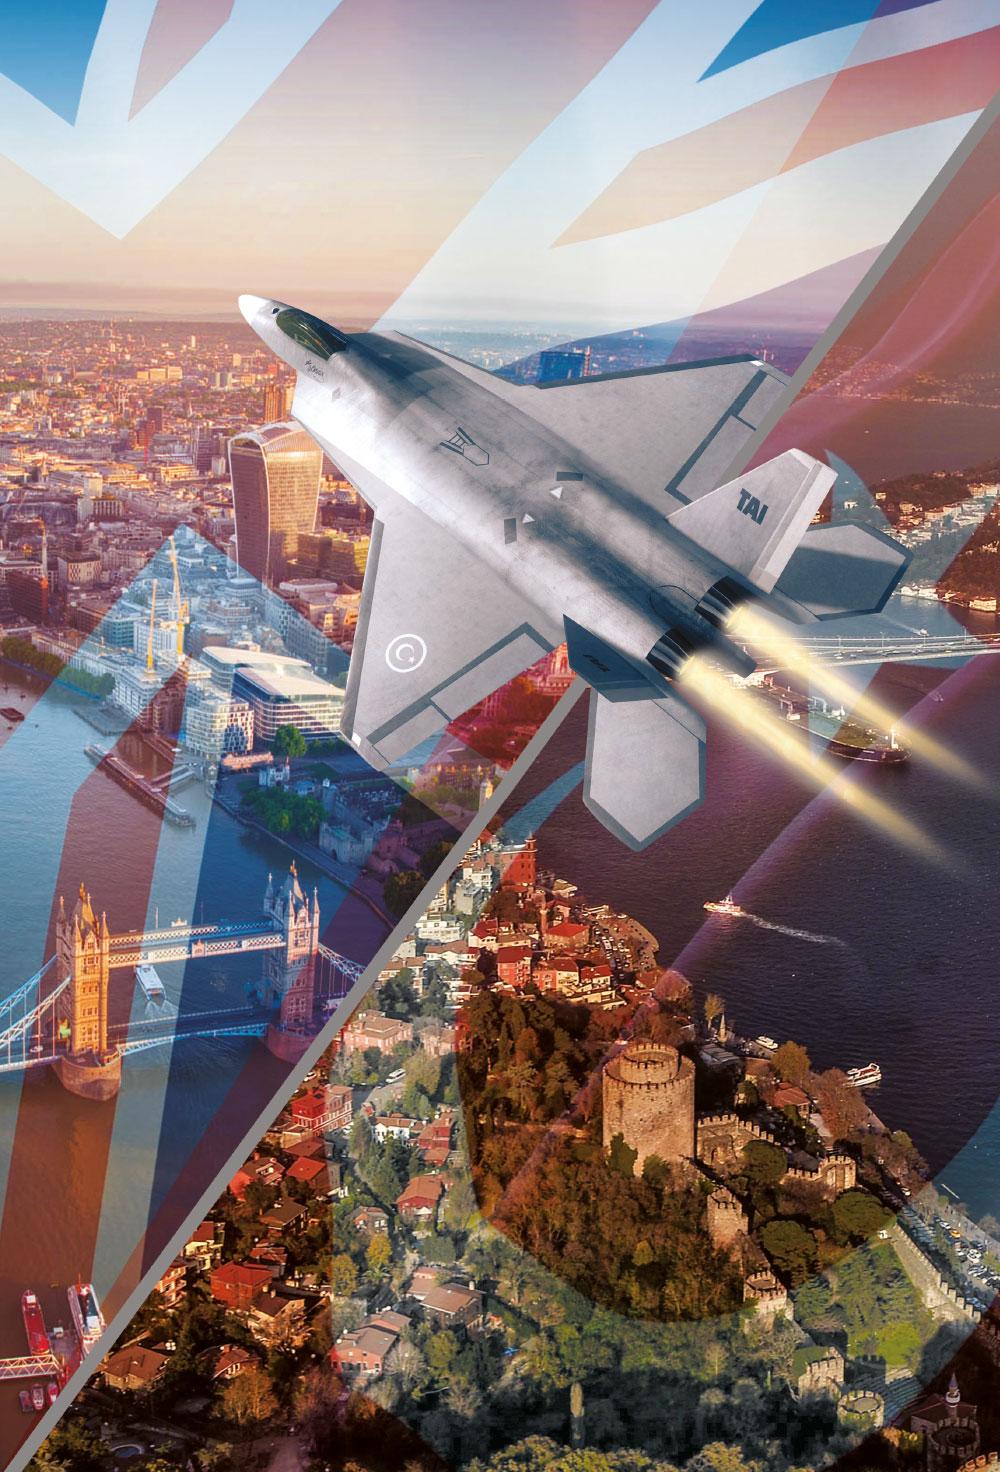 Turkey's Leading Defense & Aerospace Technology Partner: The United Kingdom